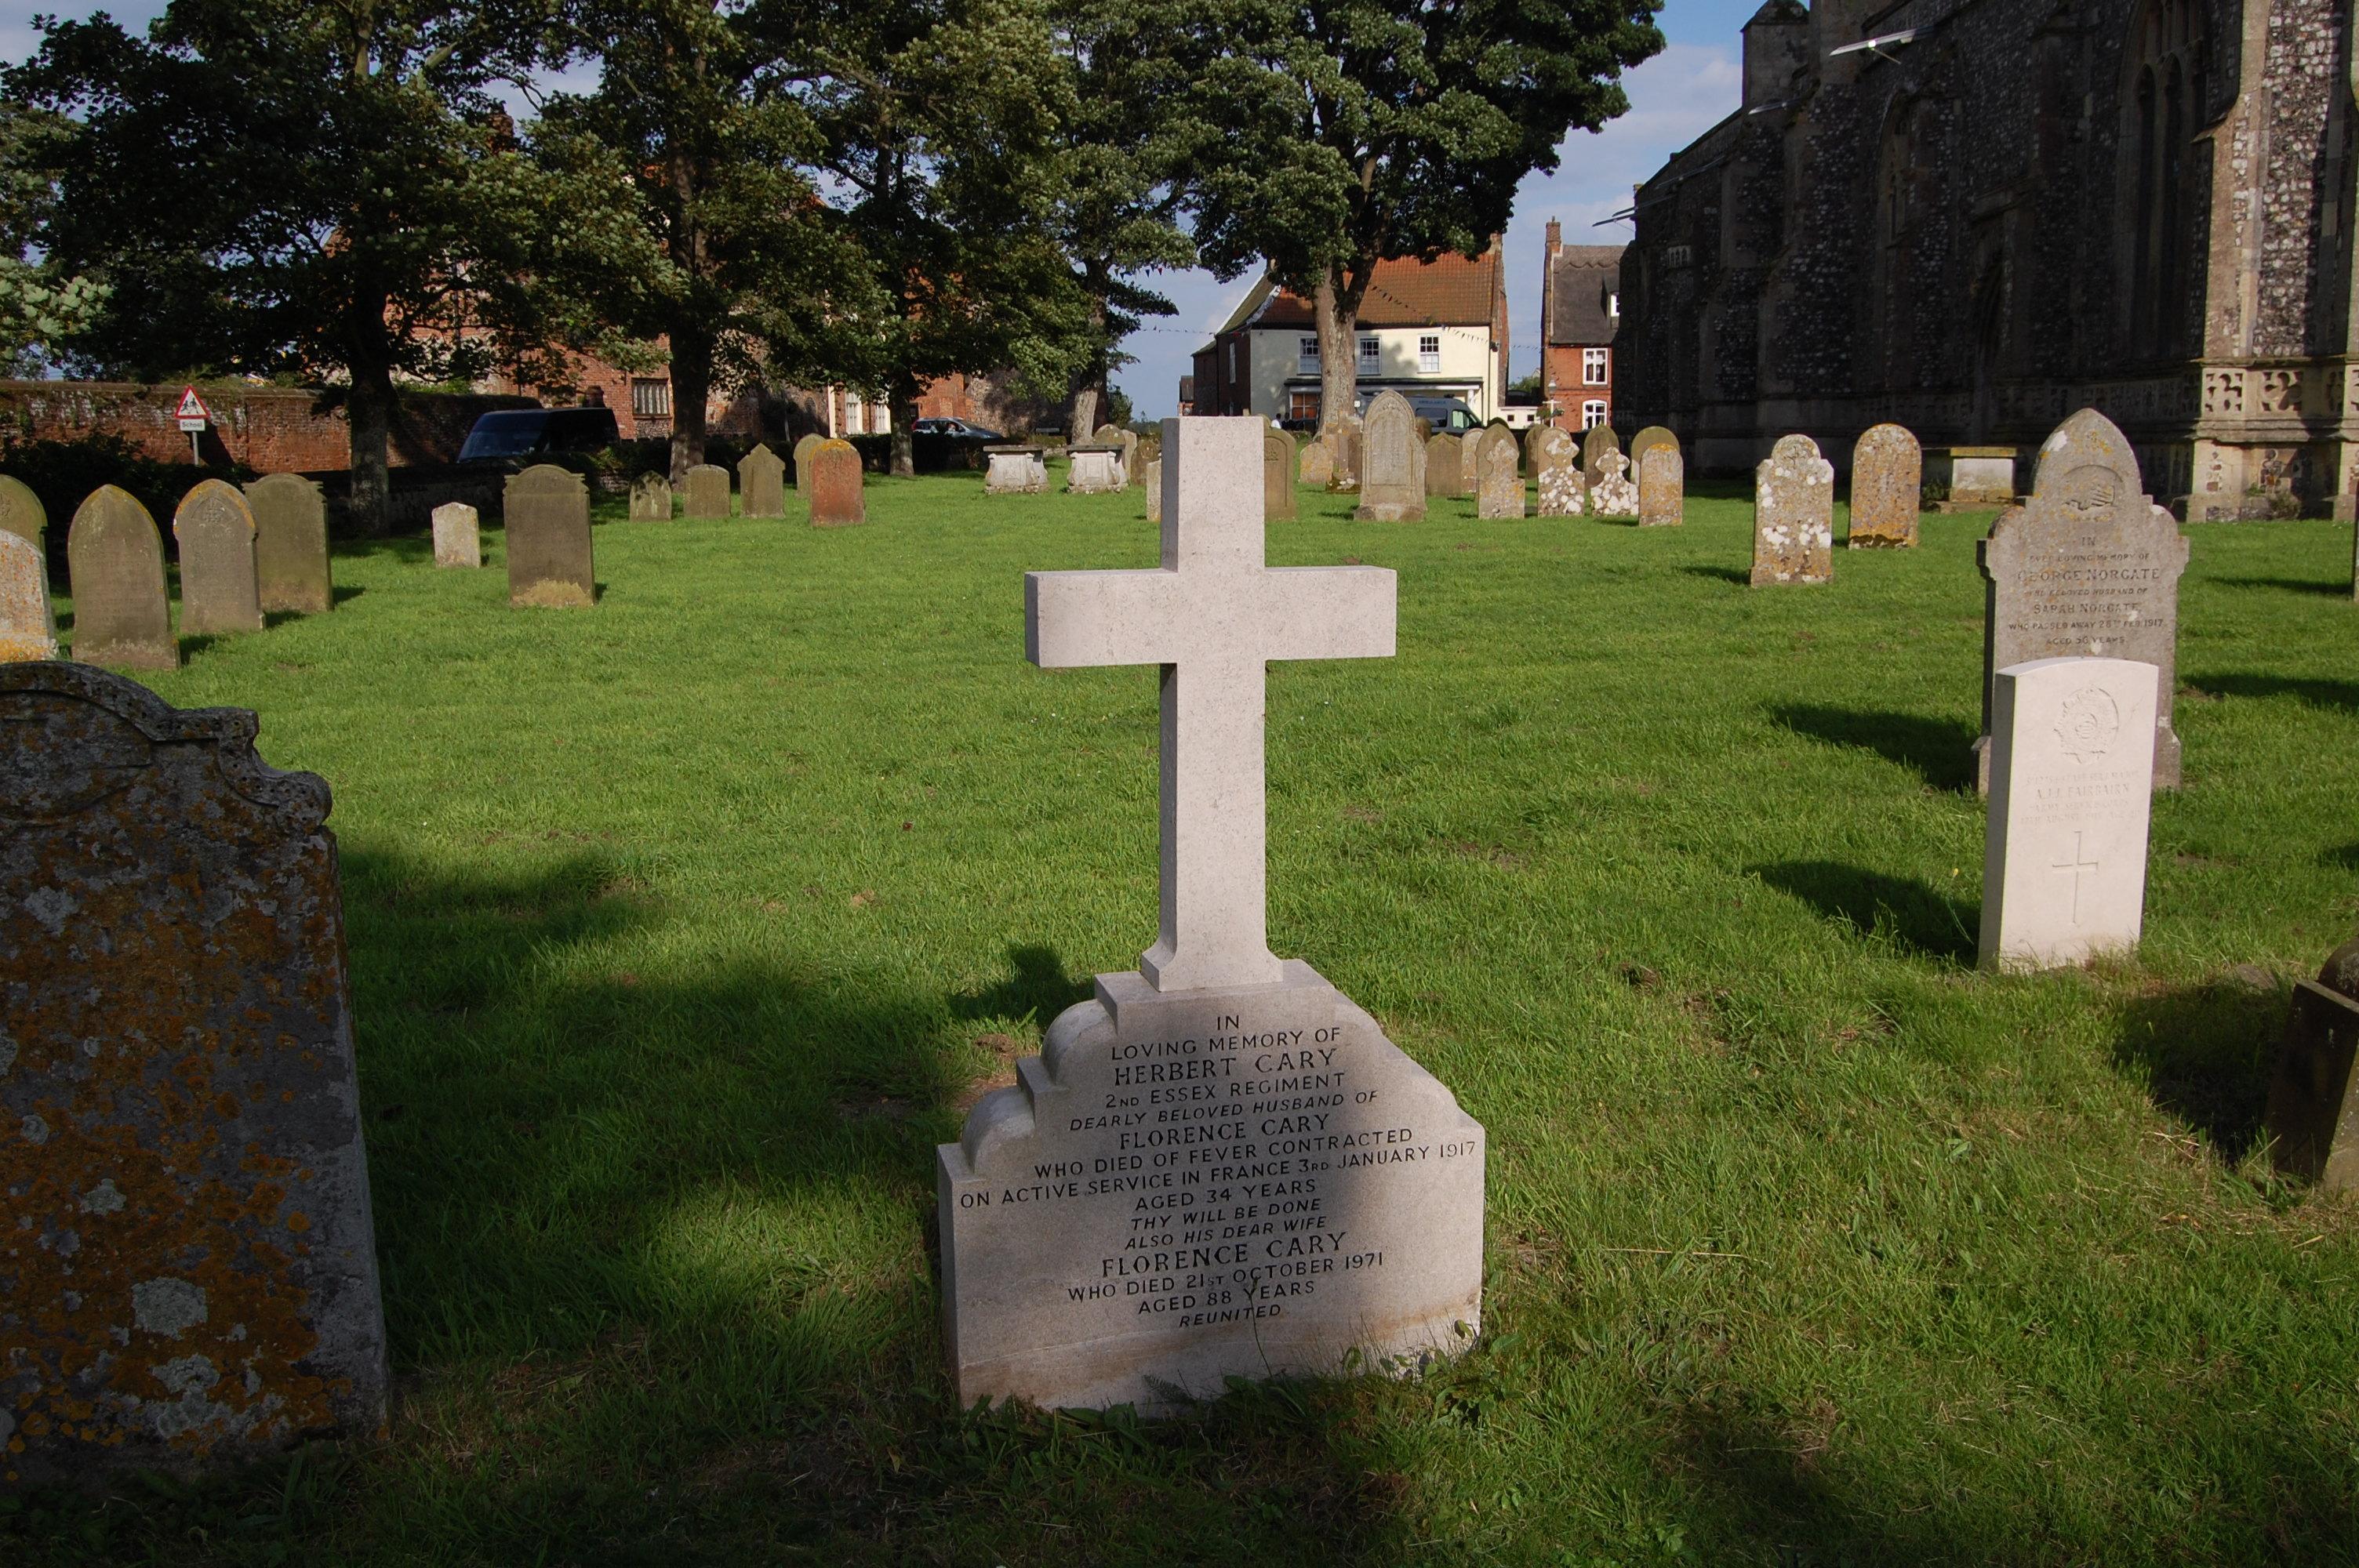 Herbert's grave in Worstead Churchyard